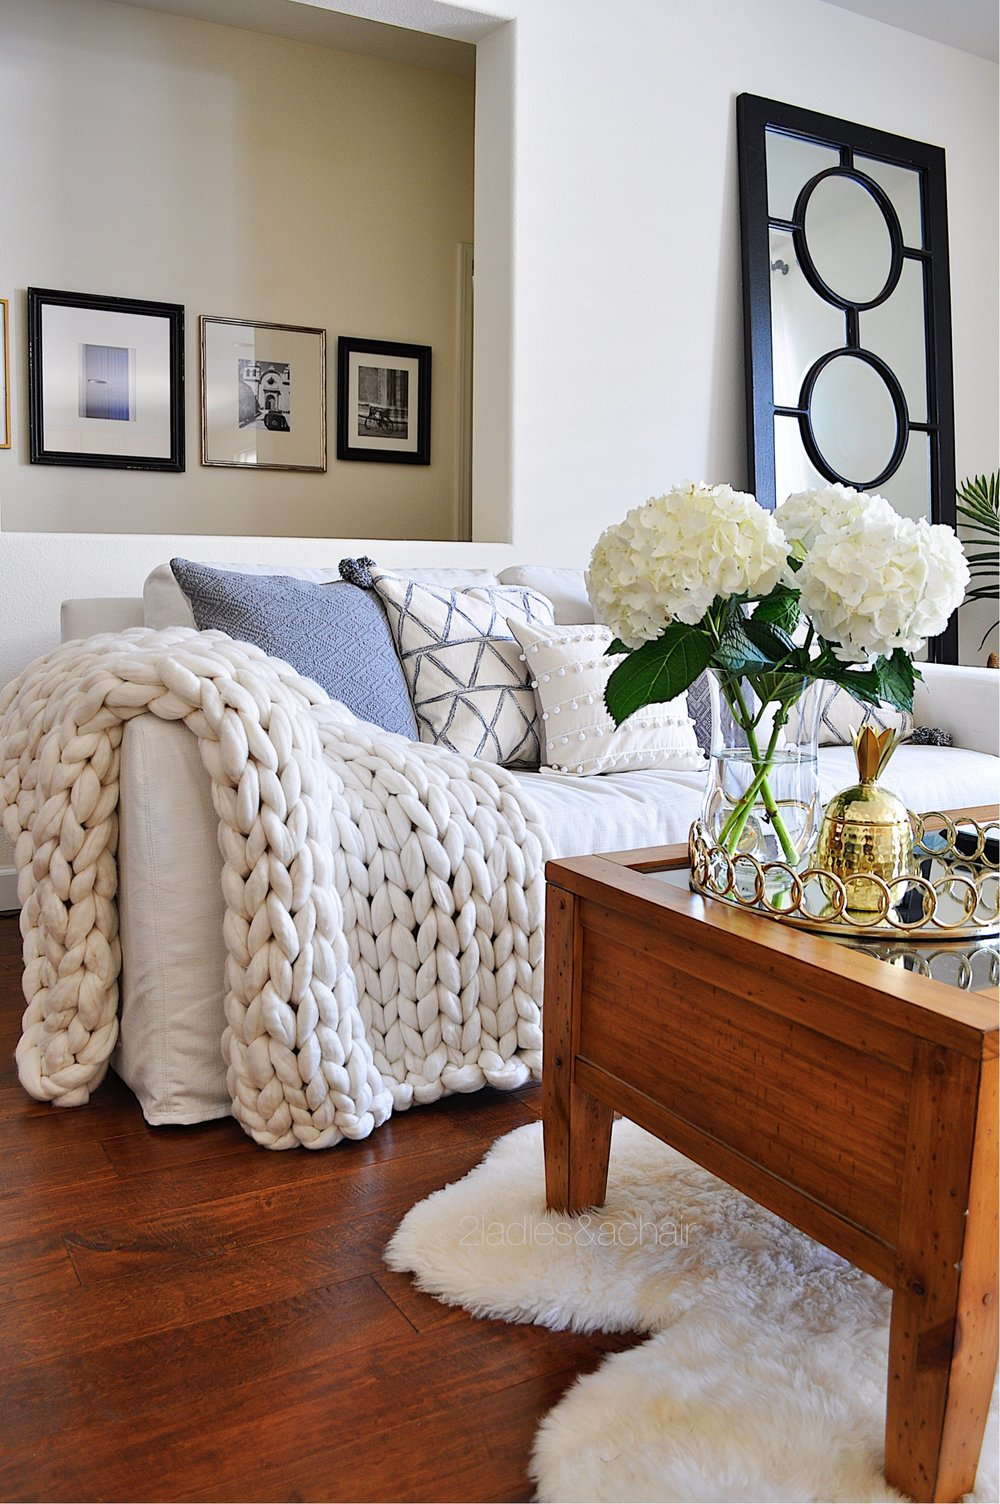 cozy home IMG_7839.JPG